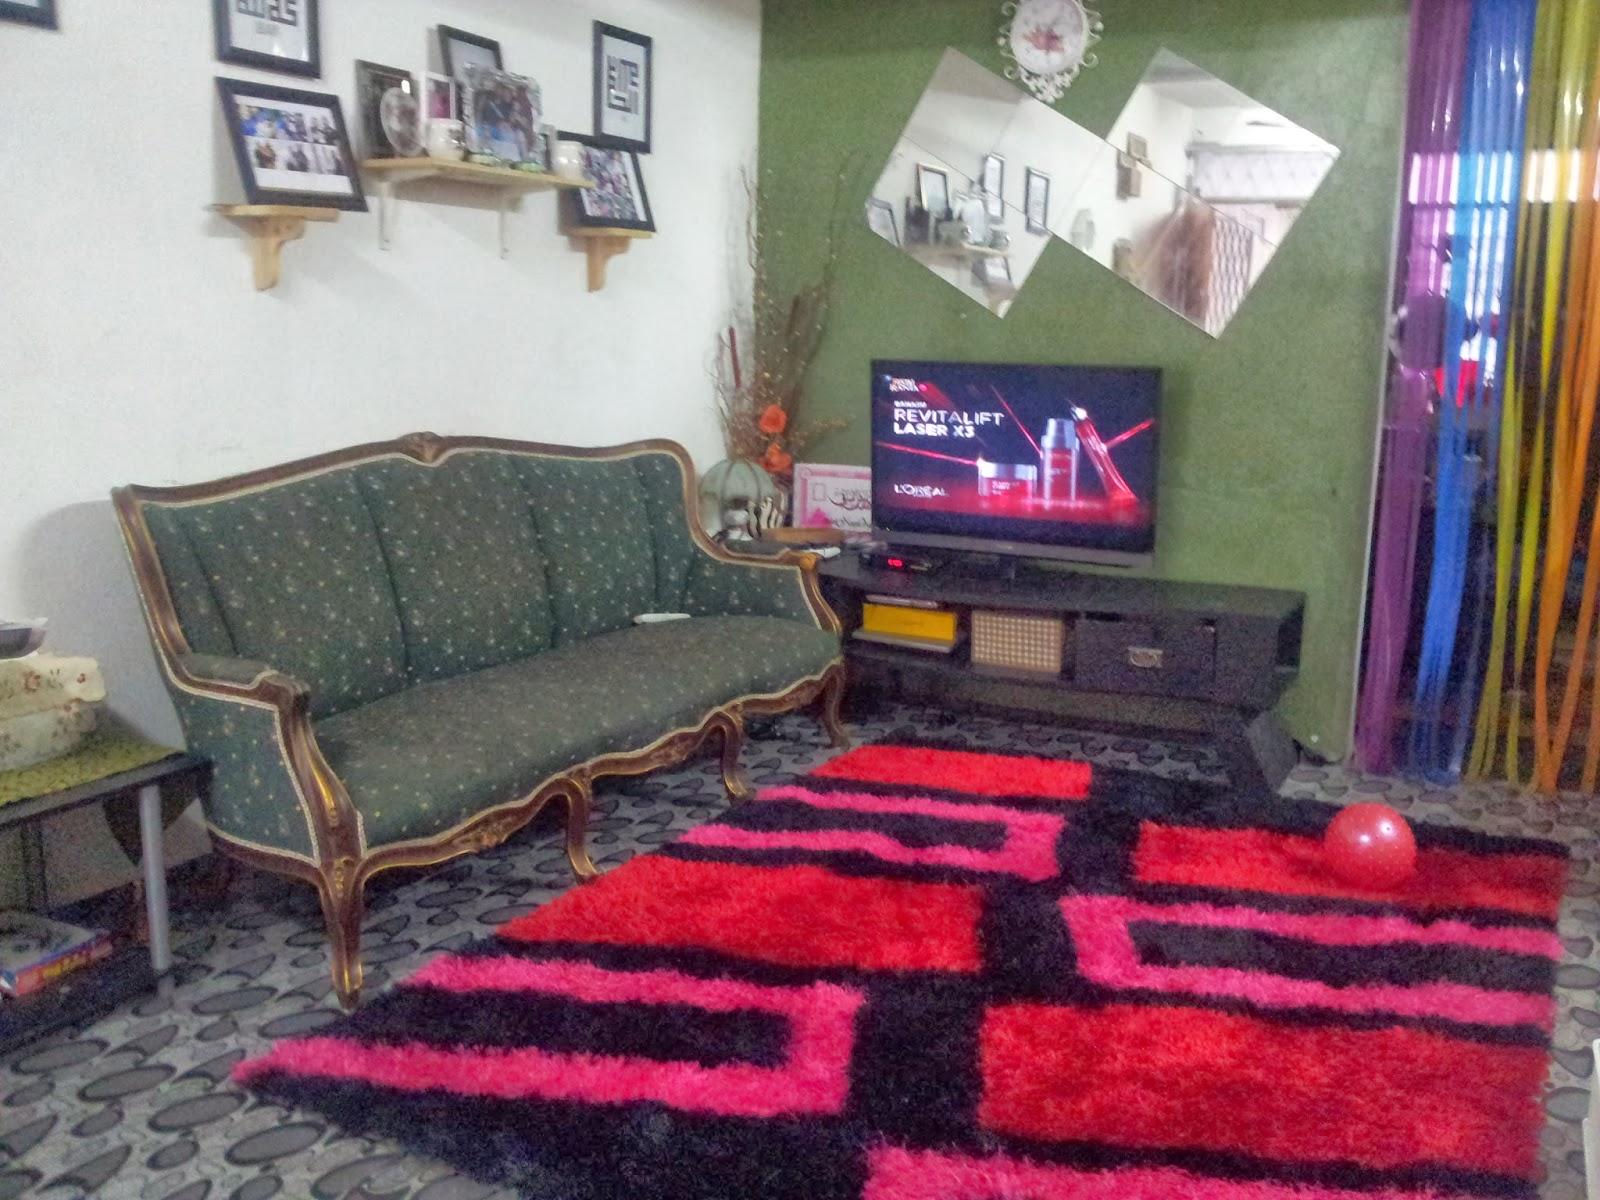 ini blog mimiziouslicious karpet vs tikat evamatik